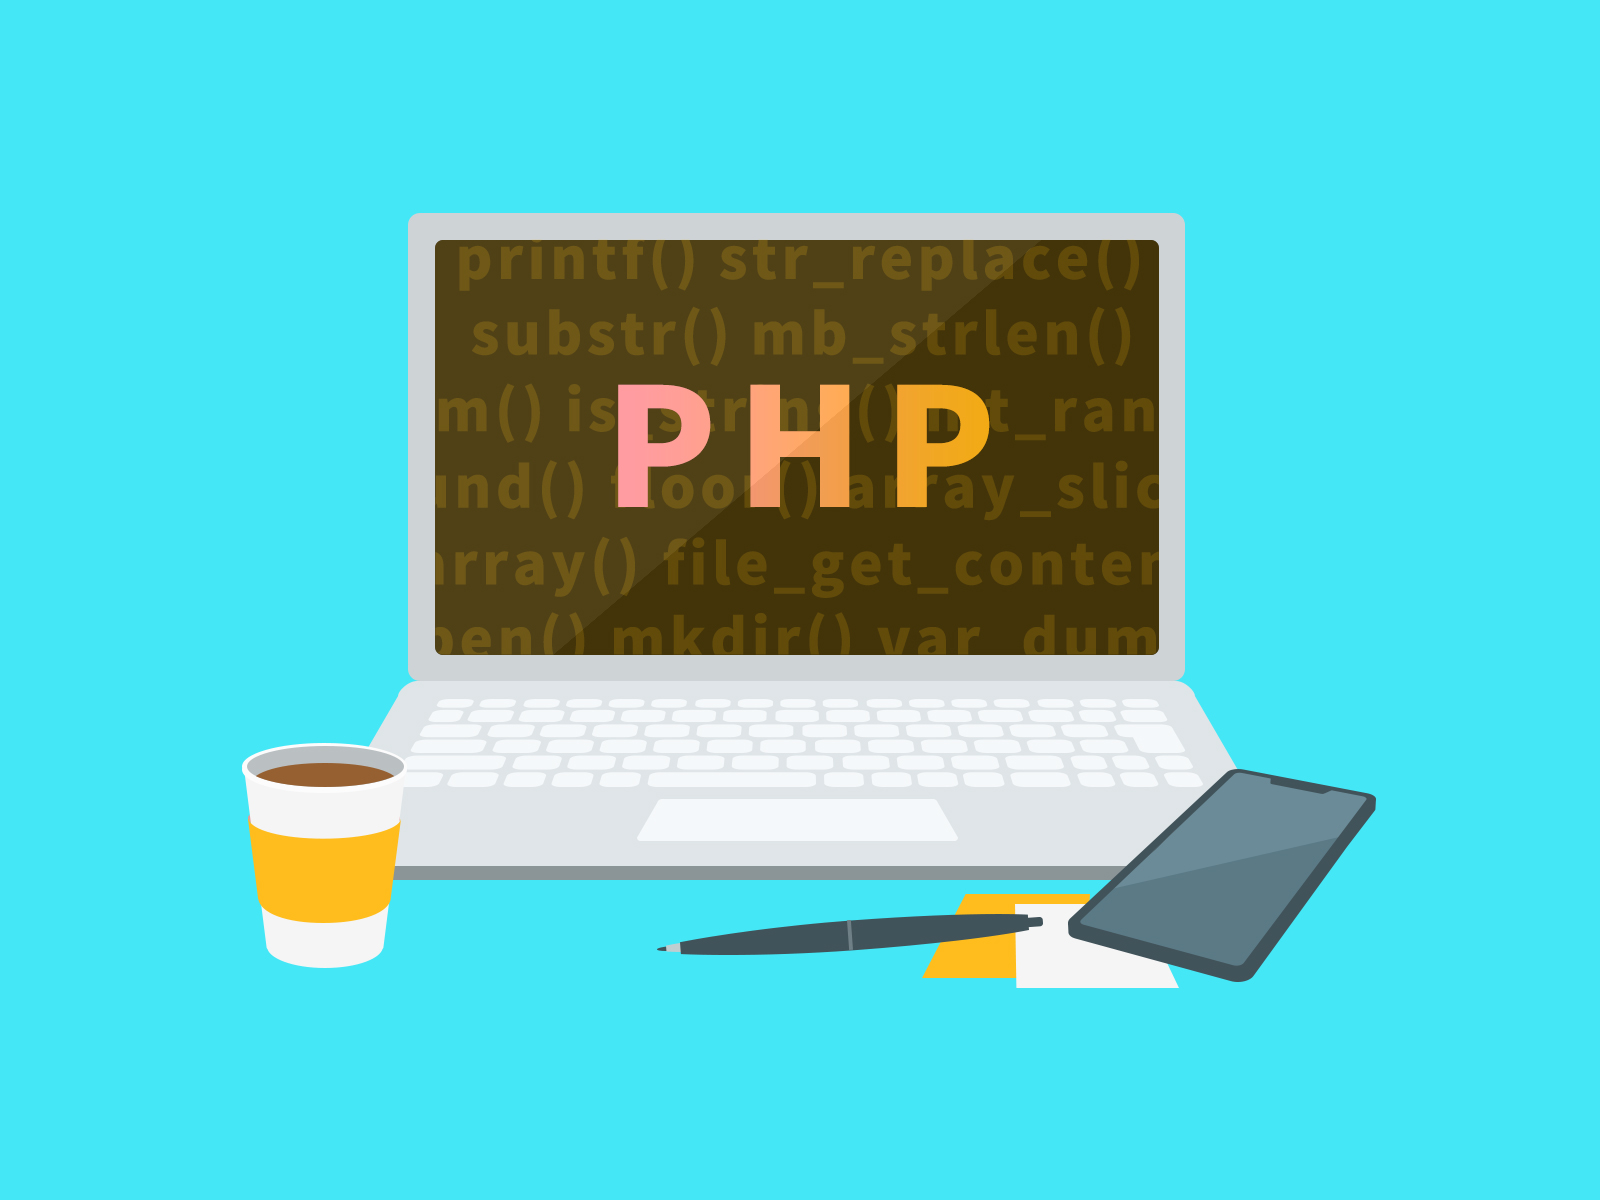 PHPエンジニアの転職事情は?